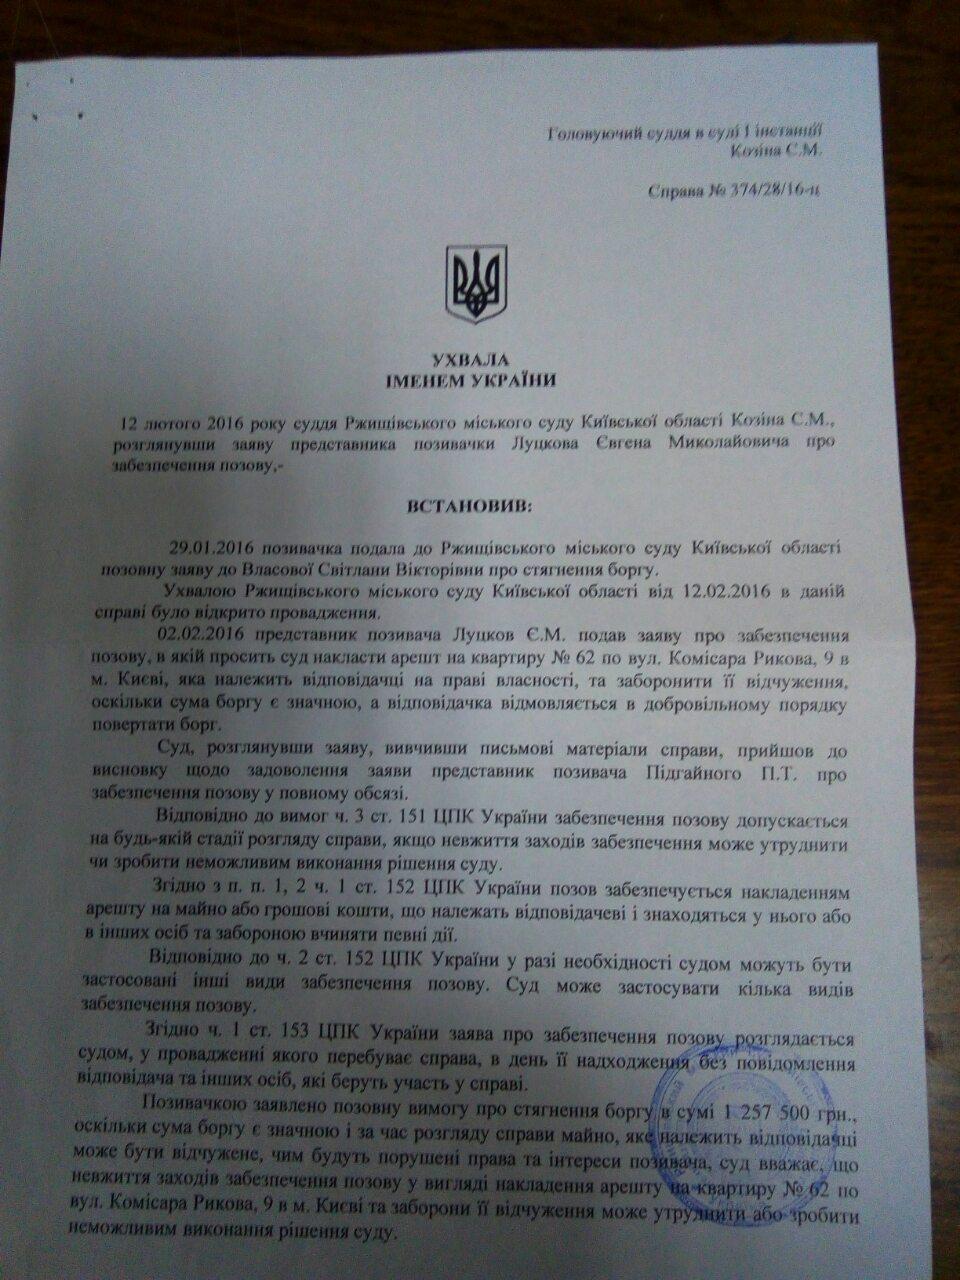 image http://forum.setam.net.ua/assets/images/818-v7Rc35pFHwrnMgeo.jpeg